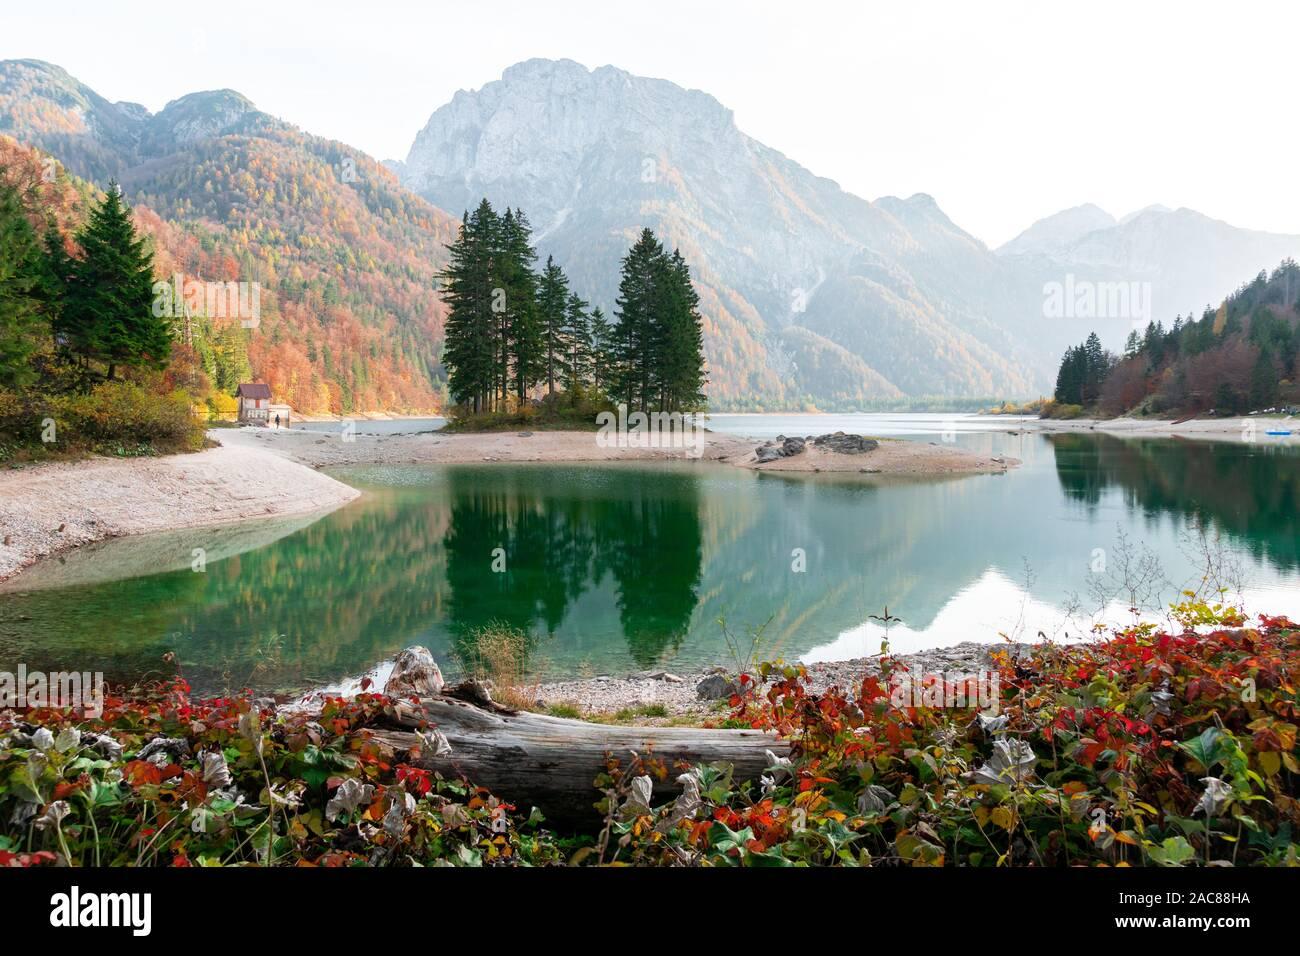 Landscape view of Predil lake shore, Italy, Europe Stock Photo